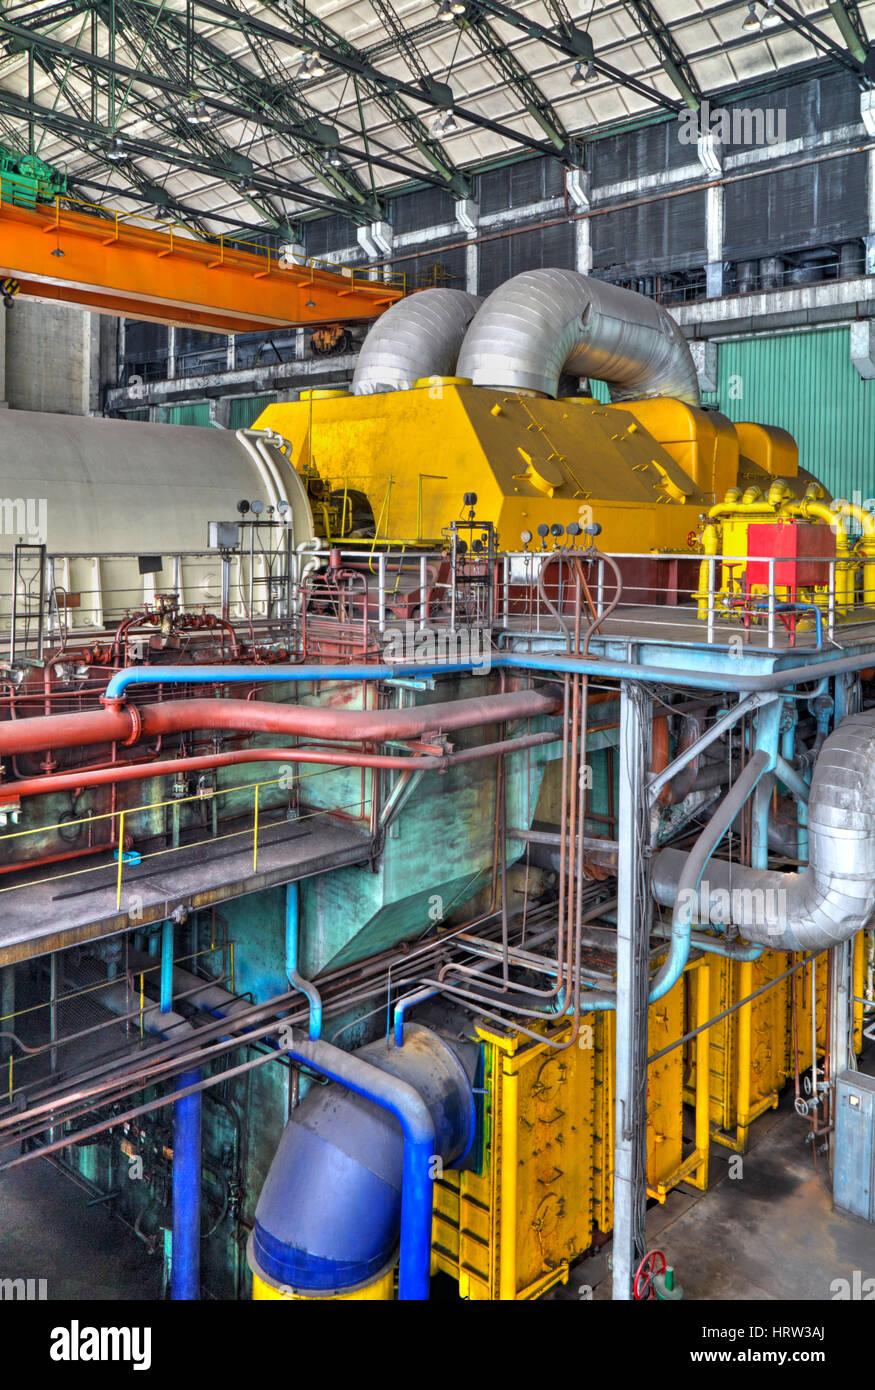 electric generator power plant. Machine Room In Thermal Power Plant With Electric Generators And Turbines Generator E